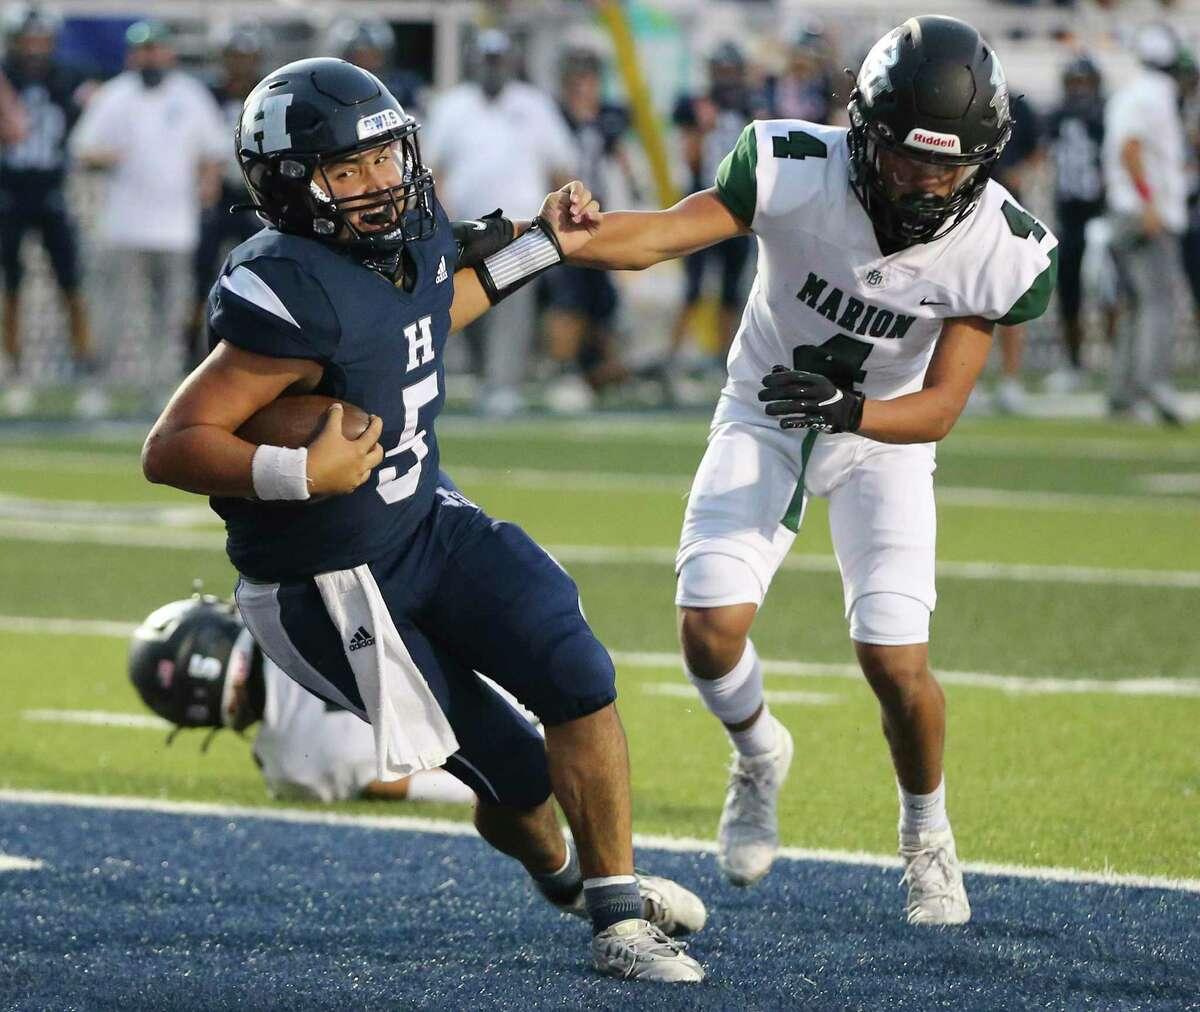 Hondo quarterback Brandon Garcia (05) scores on a three-yard keeper against Marion's Dominic Castellanos (04) during their high school football game in Hondo, Texas on Friday, Sept. 18, 2020.